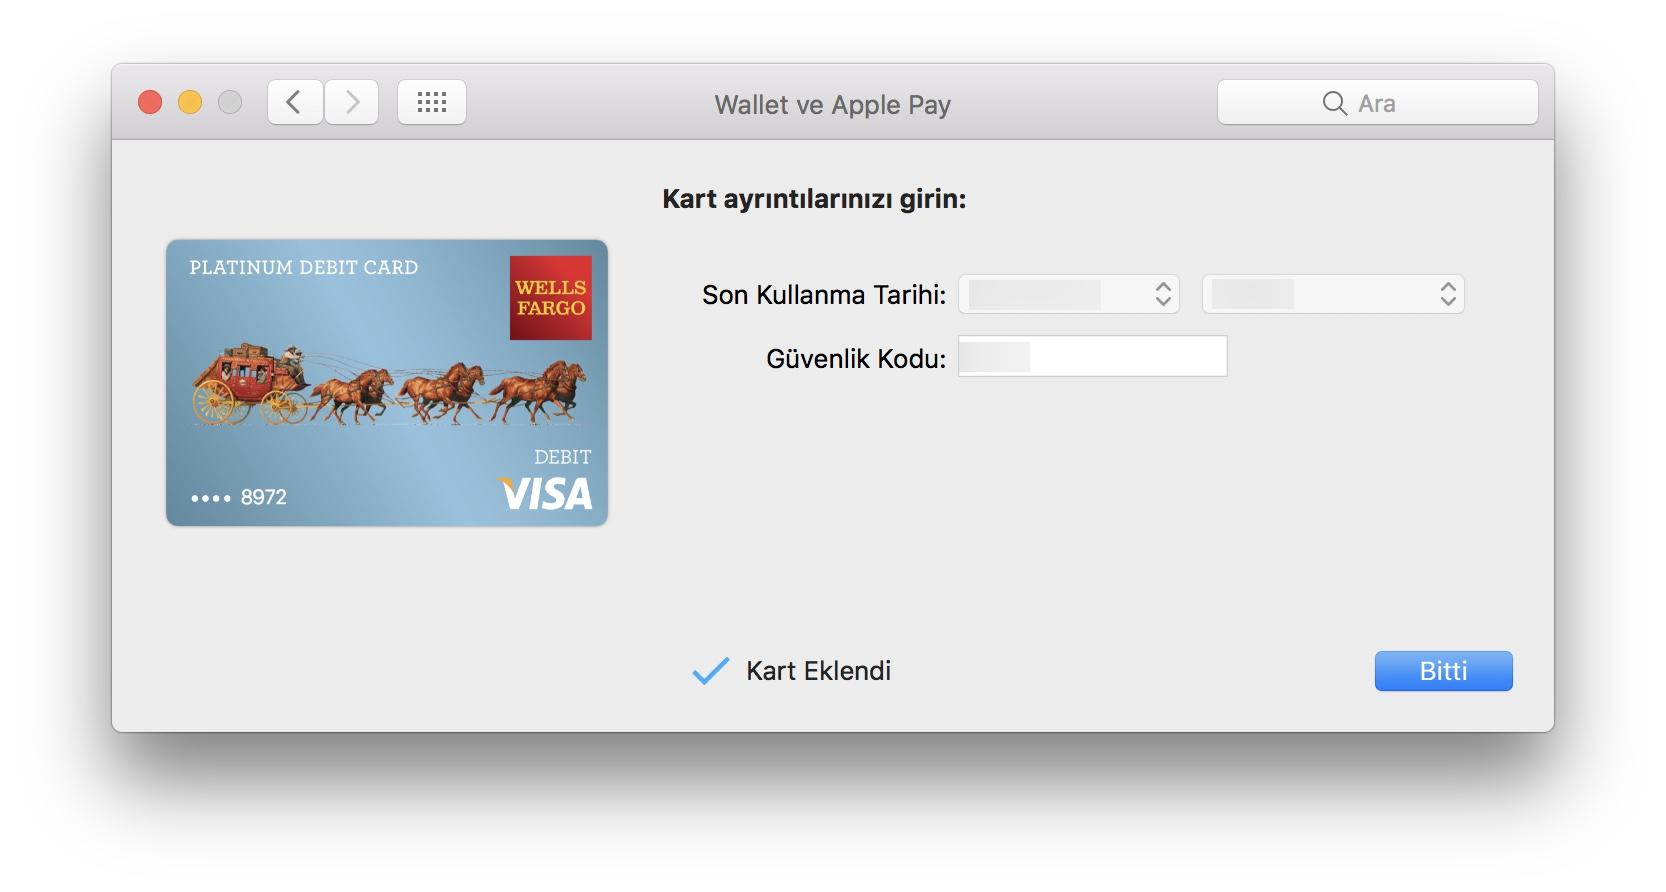 sihirli-elma-mac-apple-pay-7.jpg